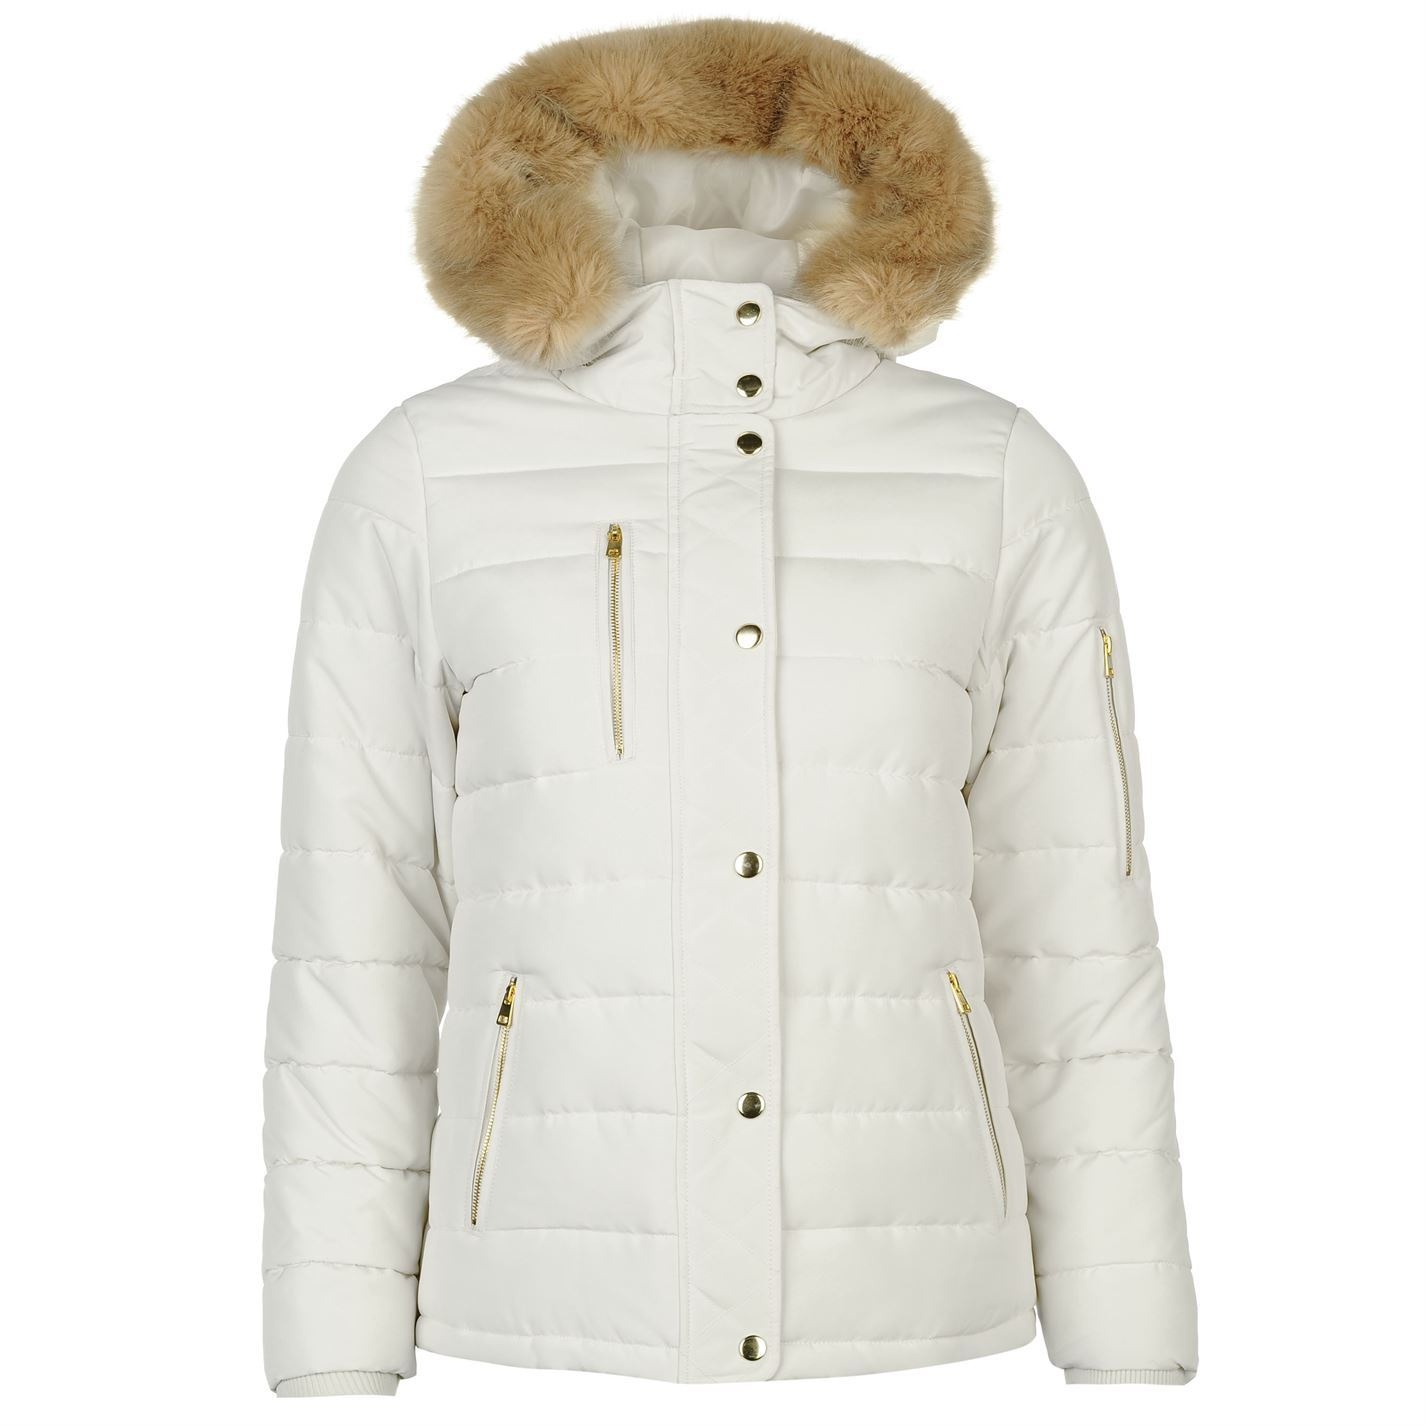 Golddigga Womens Bubble Jacket Padded Coat Top Lightweight Hooded ... d6f0904cc3ea